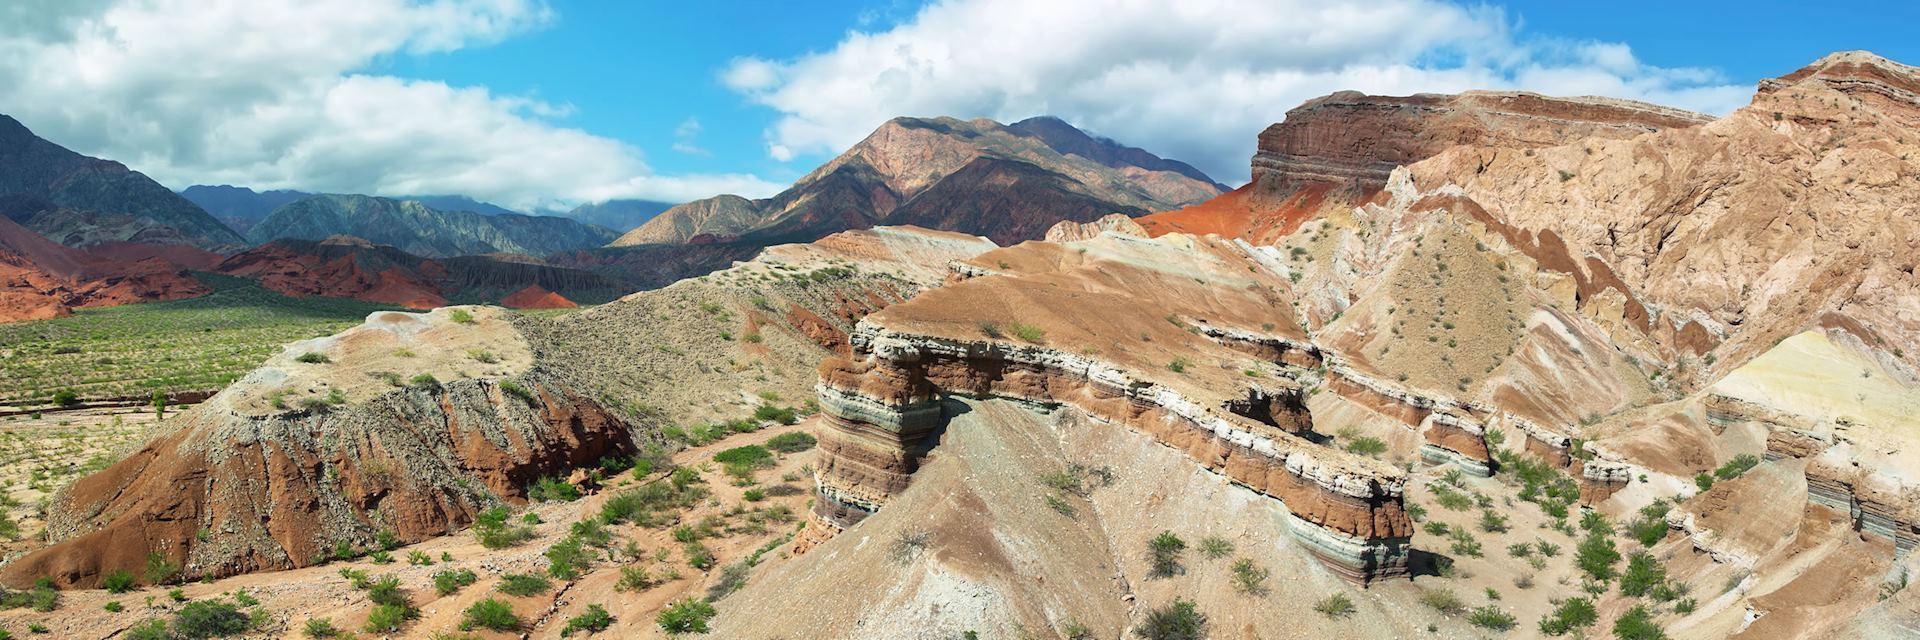 Mountains of Quebrada de las Conchas, Argentina